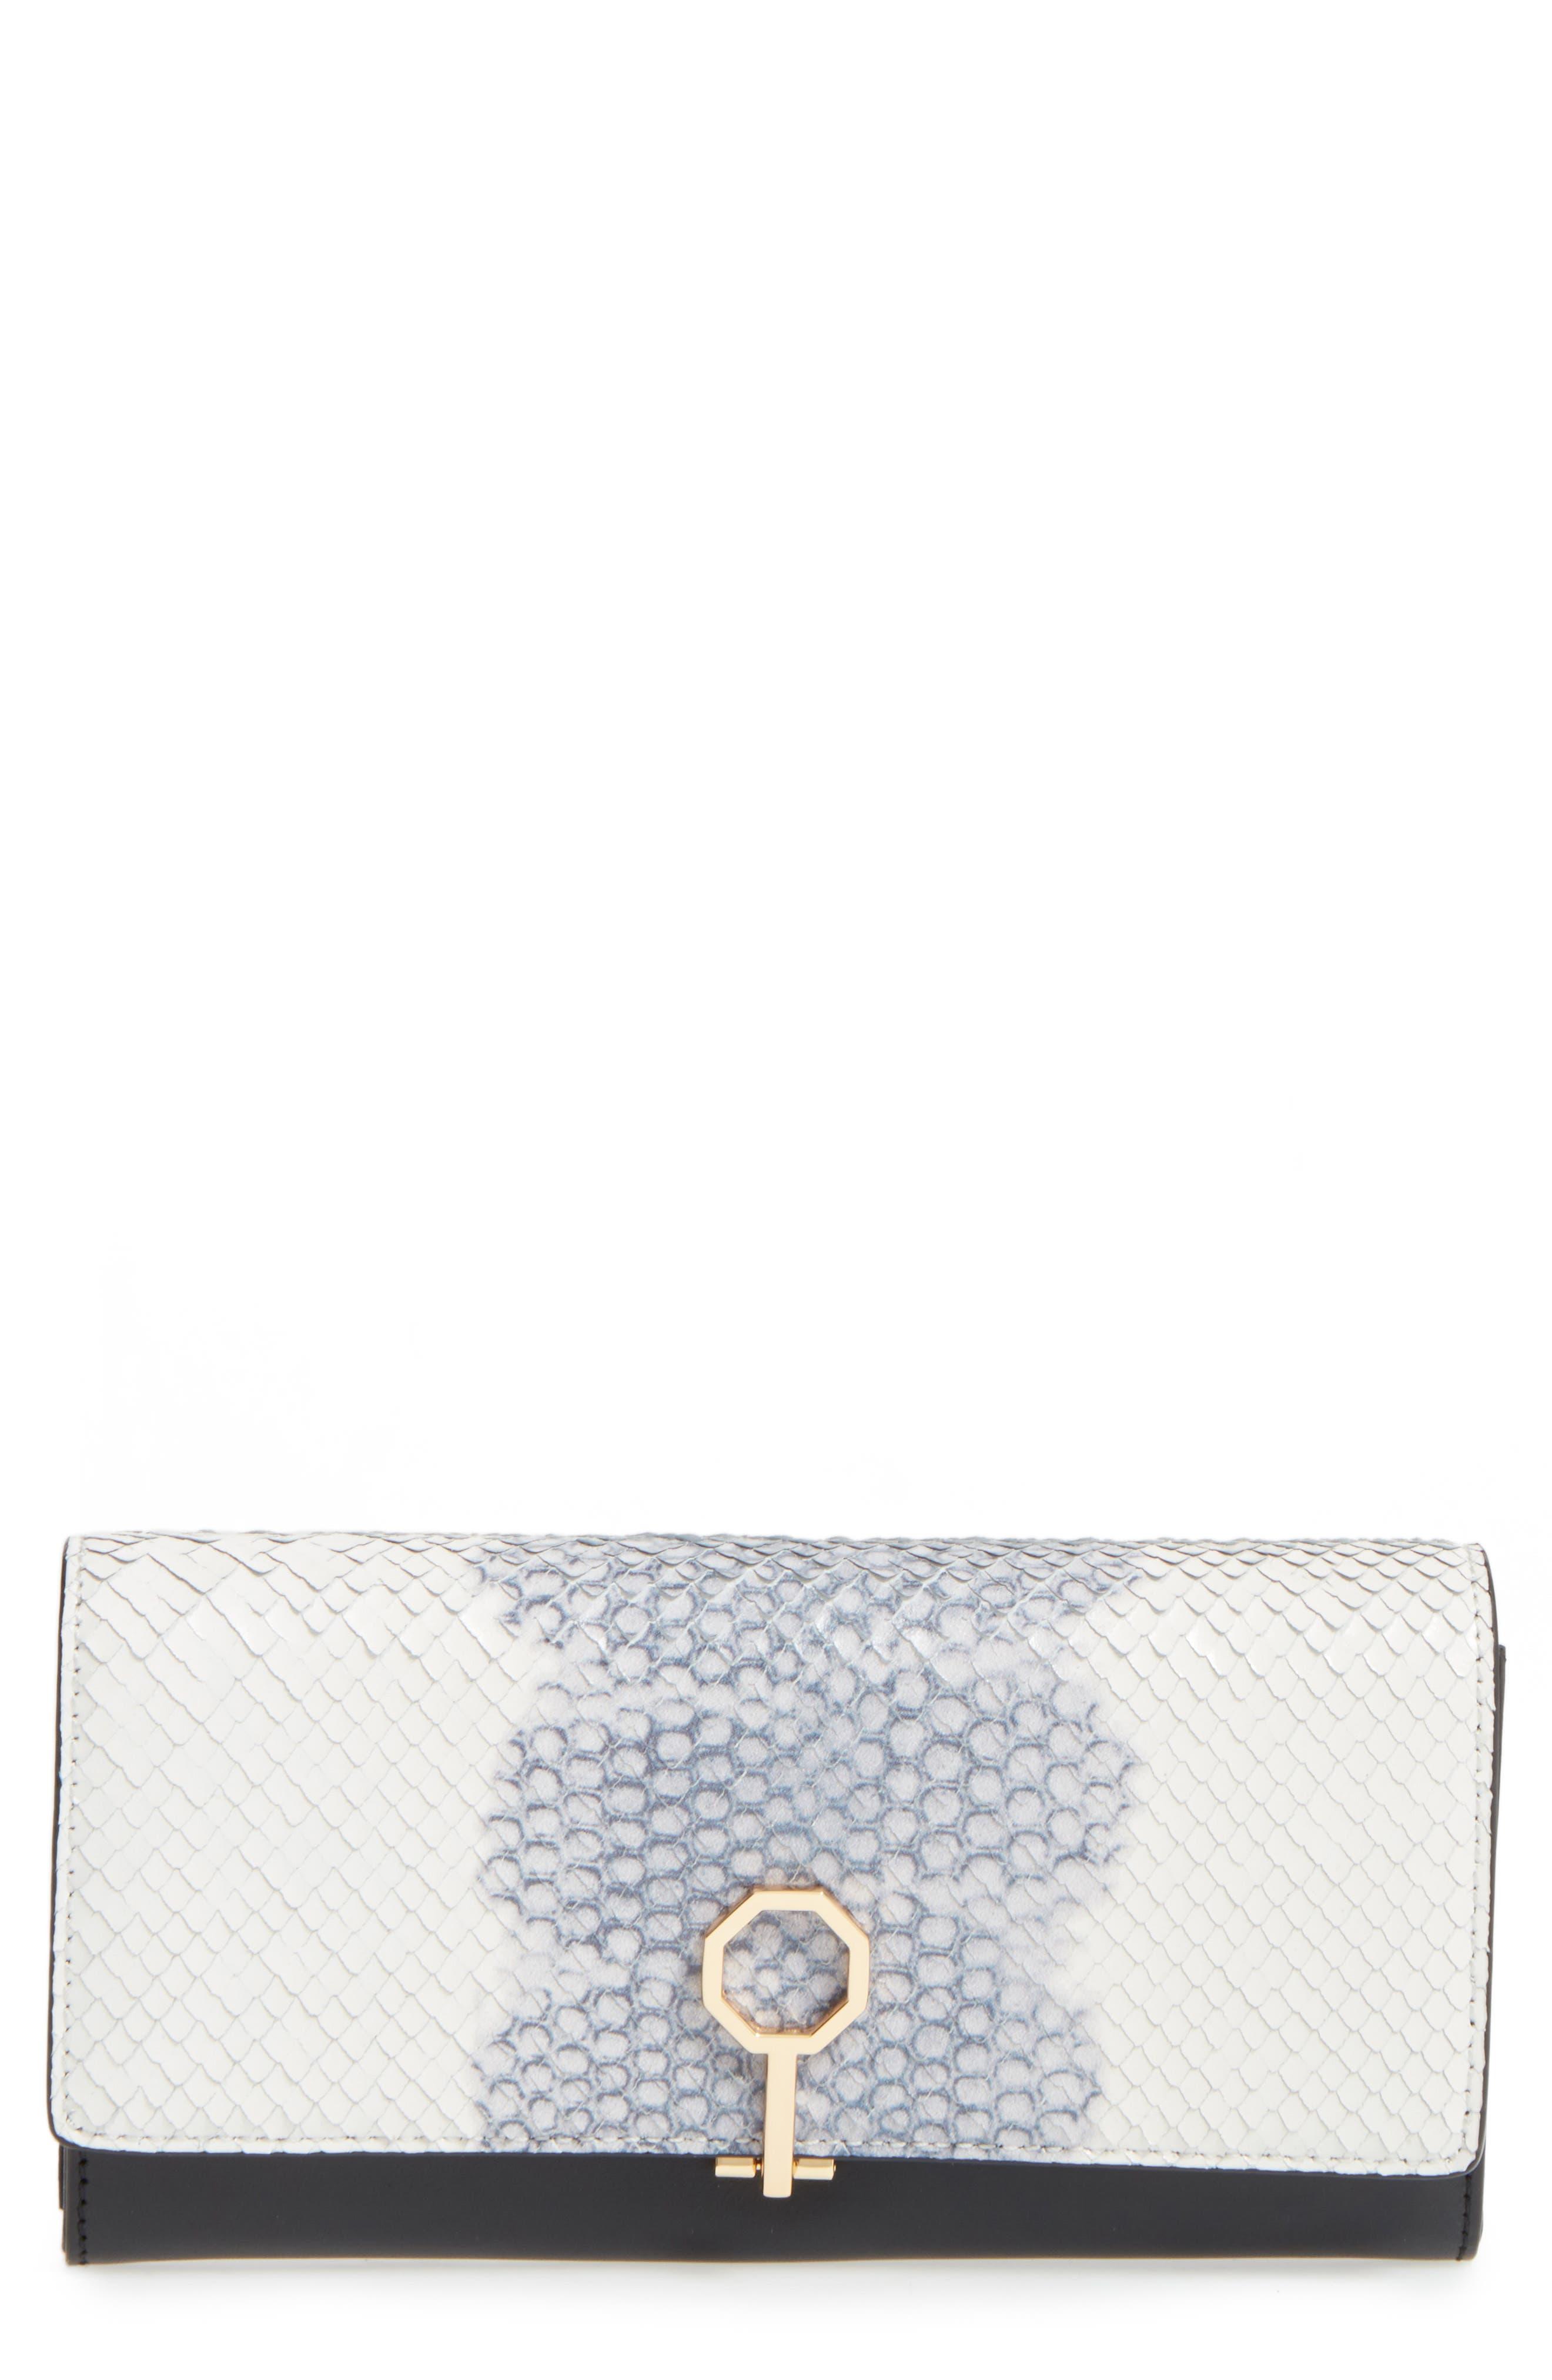 Main Image - Louise et Cie Yvette Embossed Leather Wallet